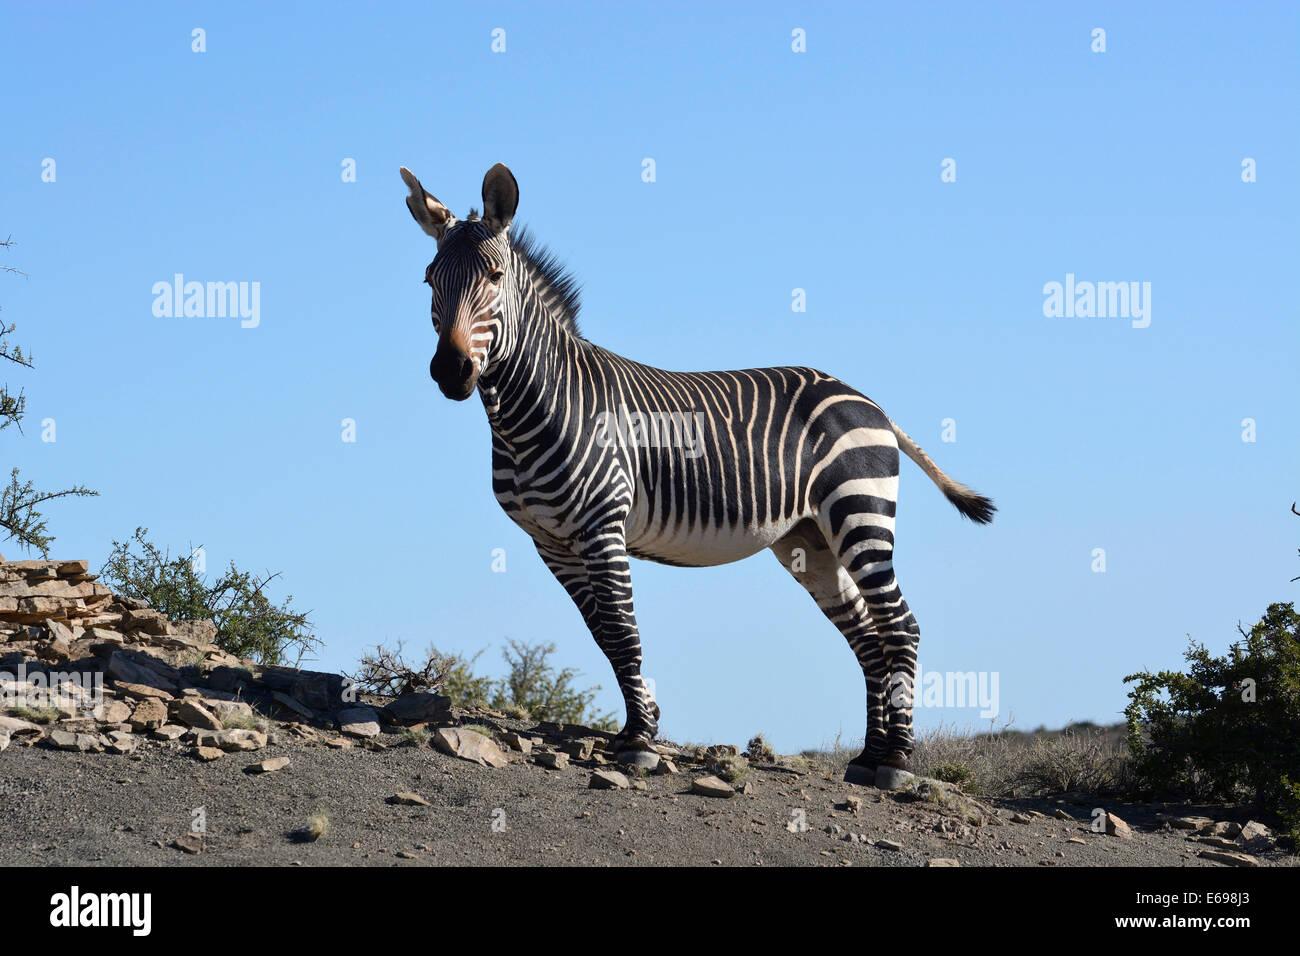 Cape Mountain Zebra (Equus zebra zebra), Western Cape, South Africa Stock Photo